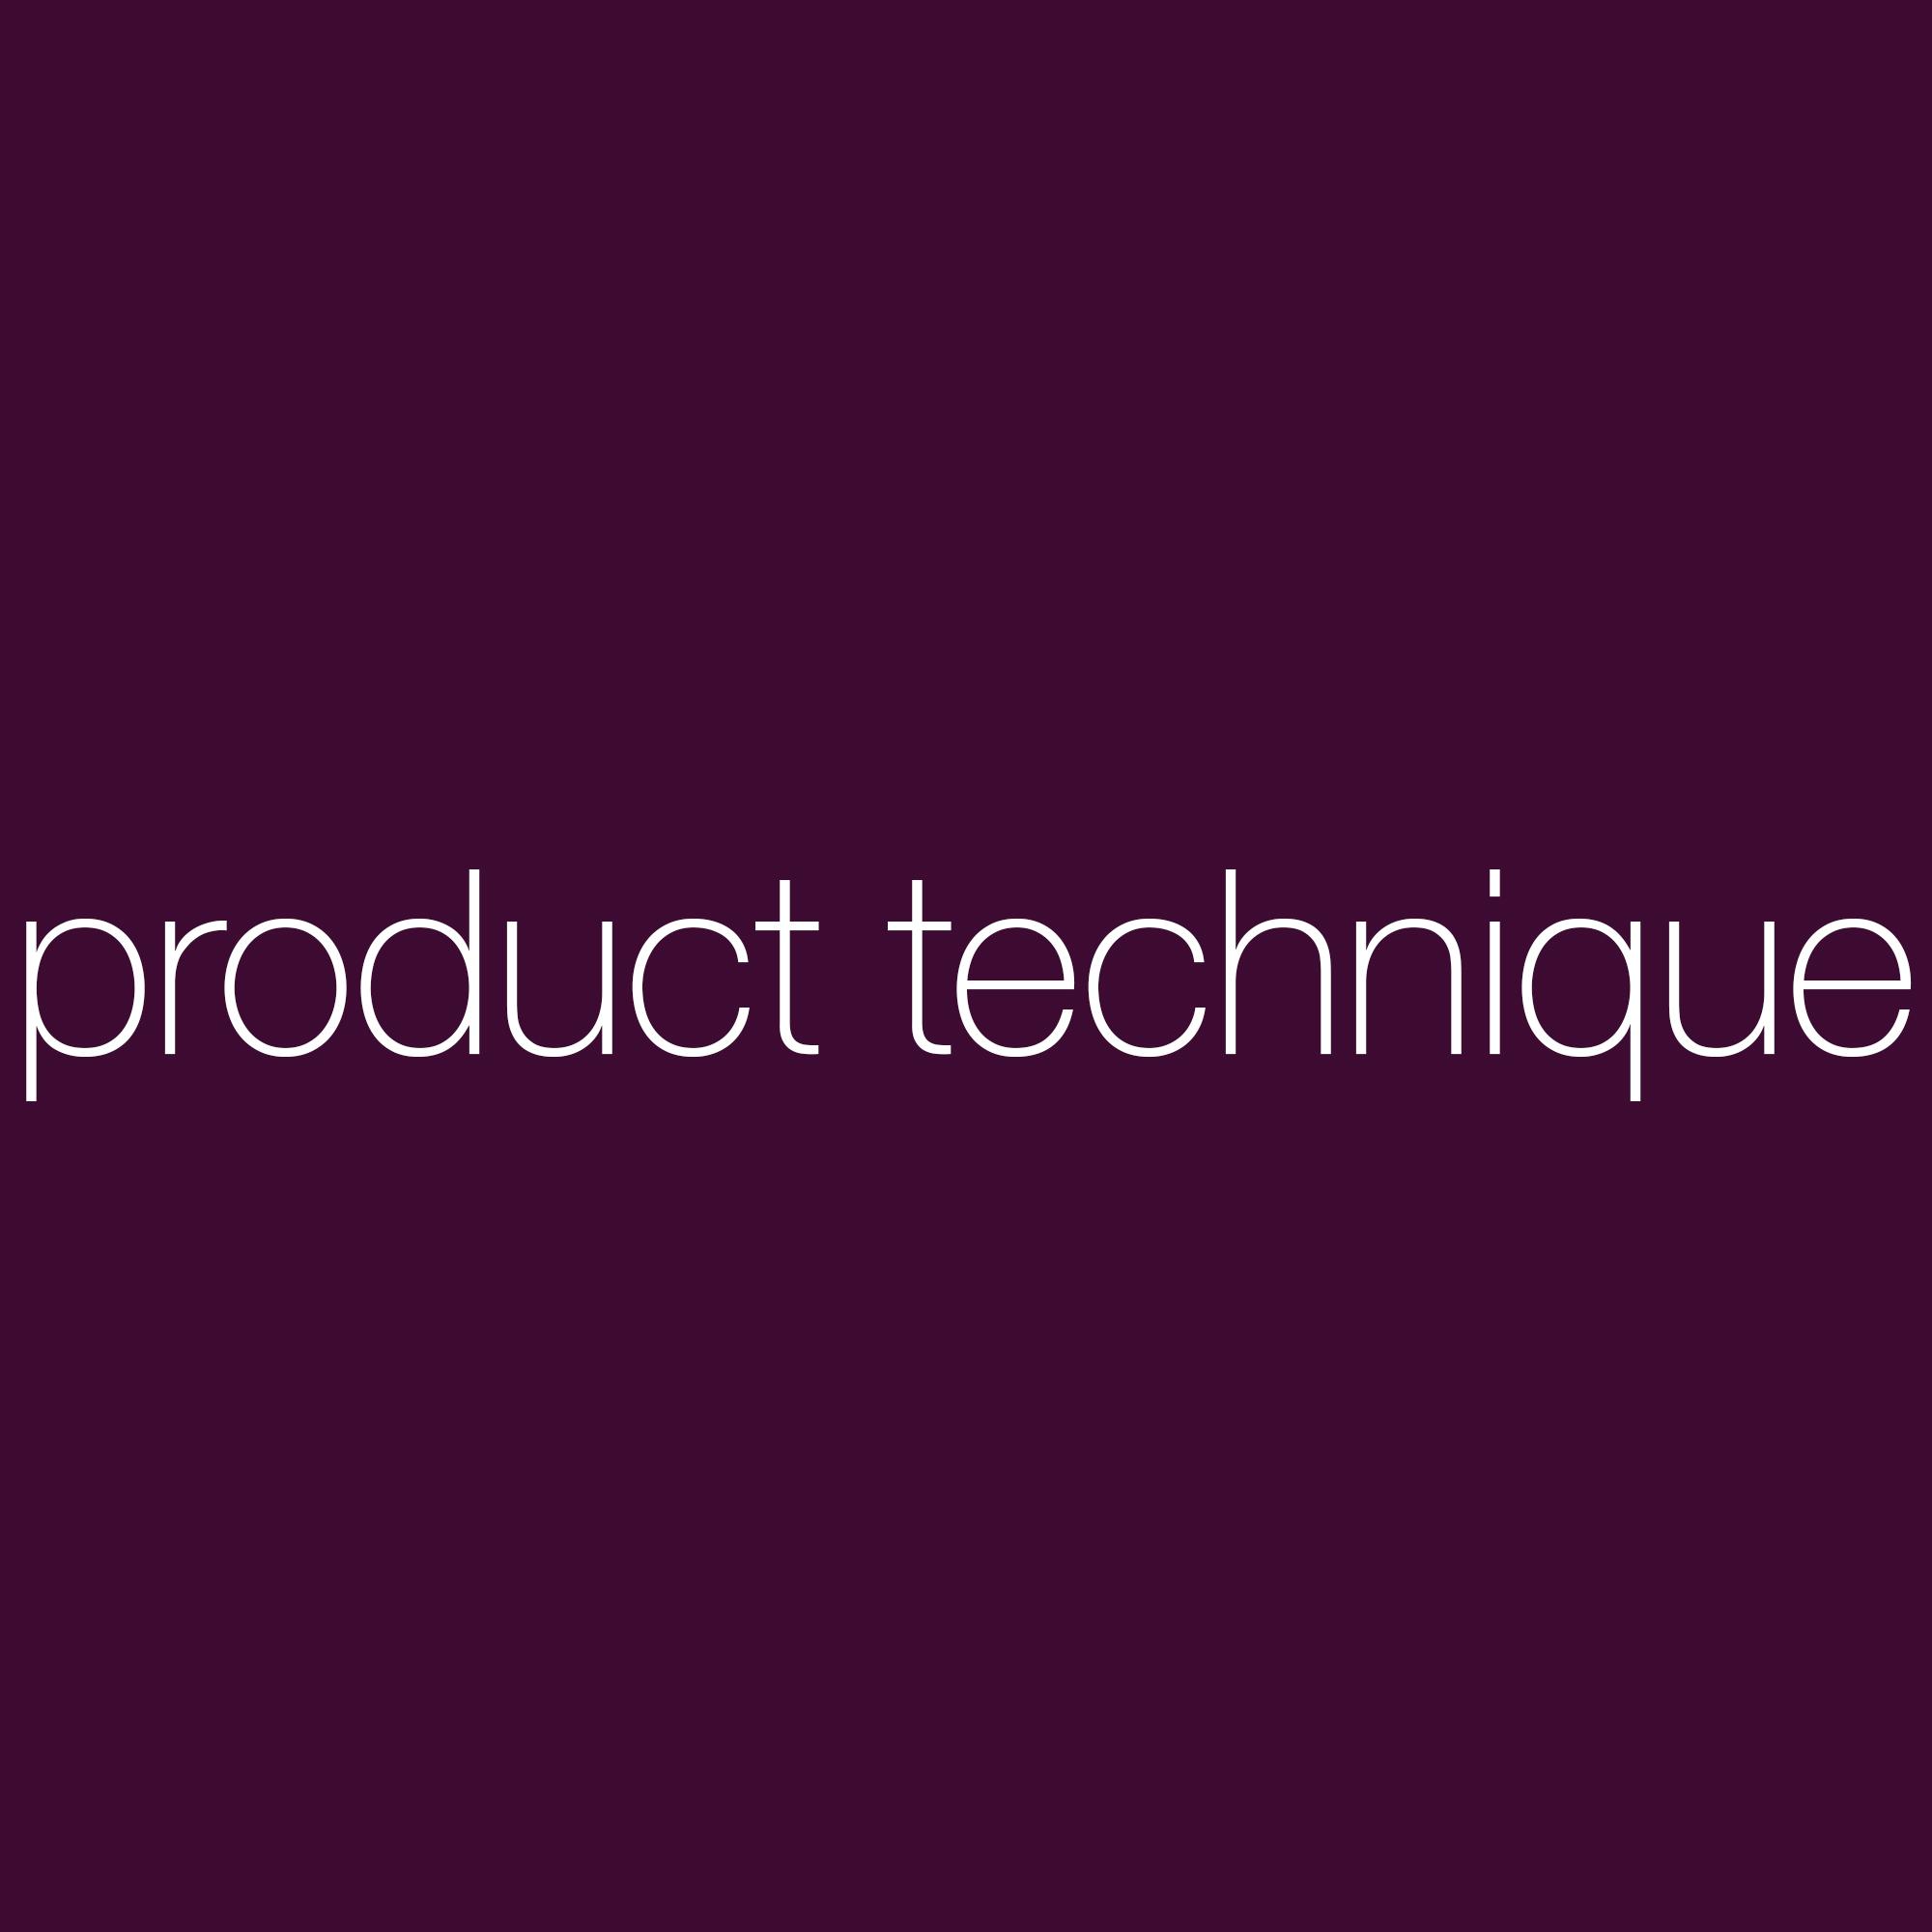 sidebar-icon-attribute-product-technique